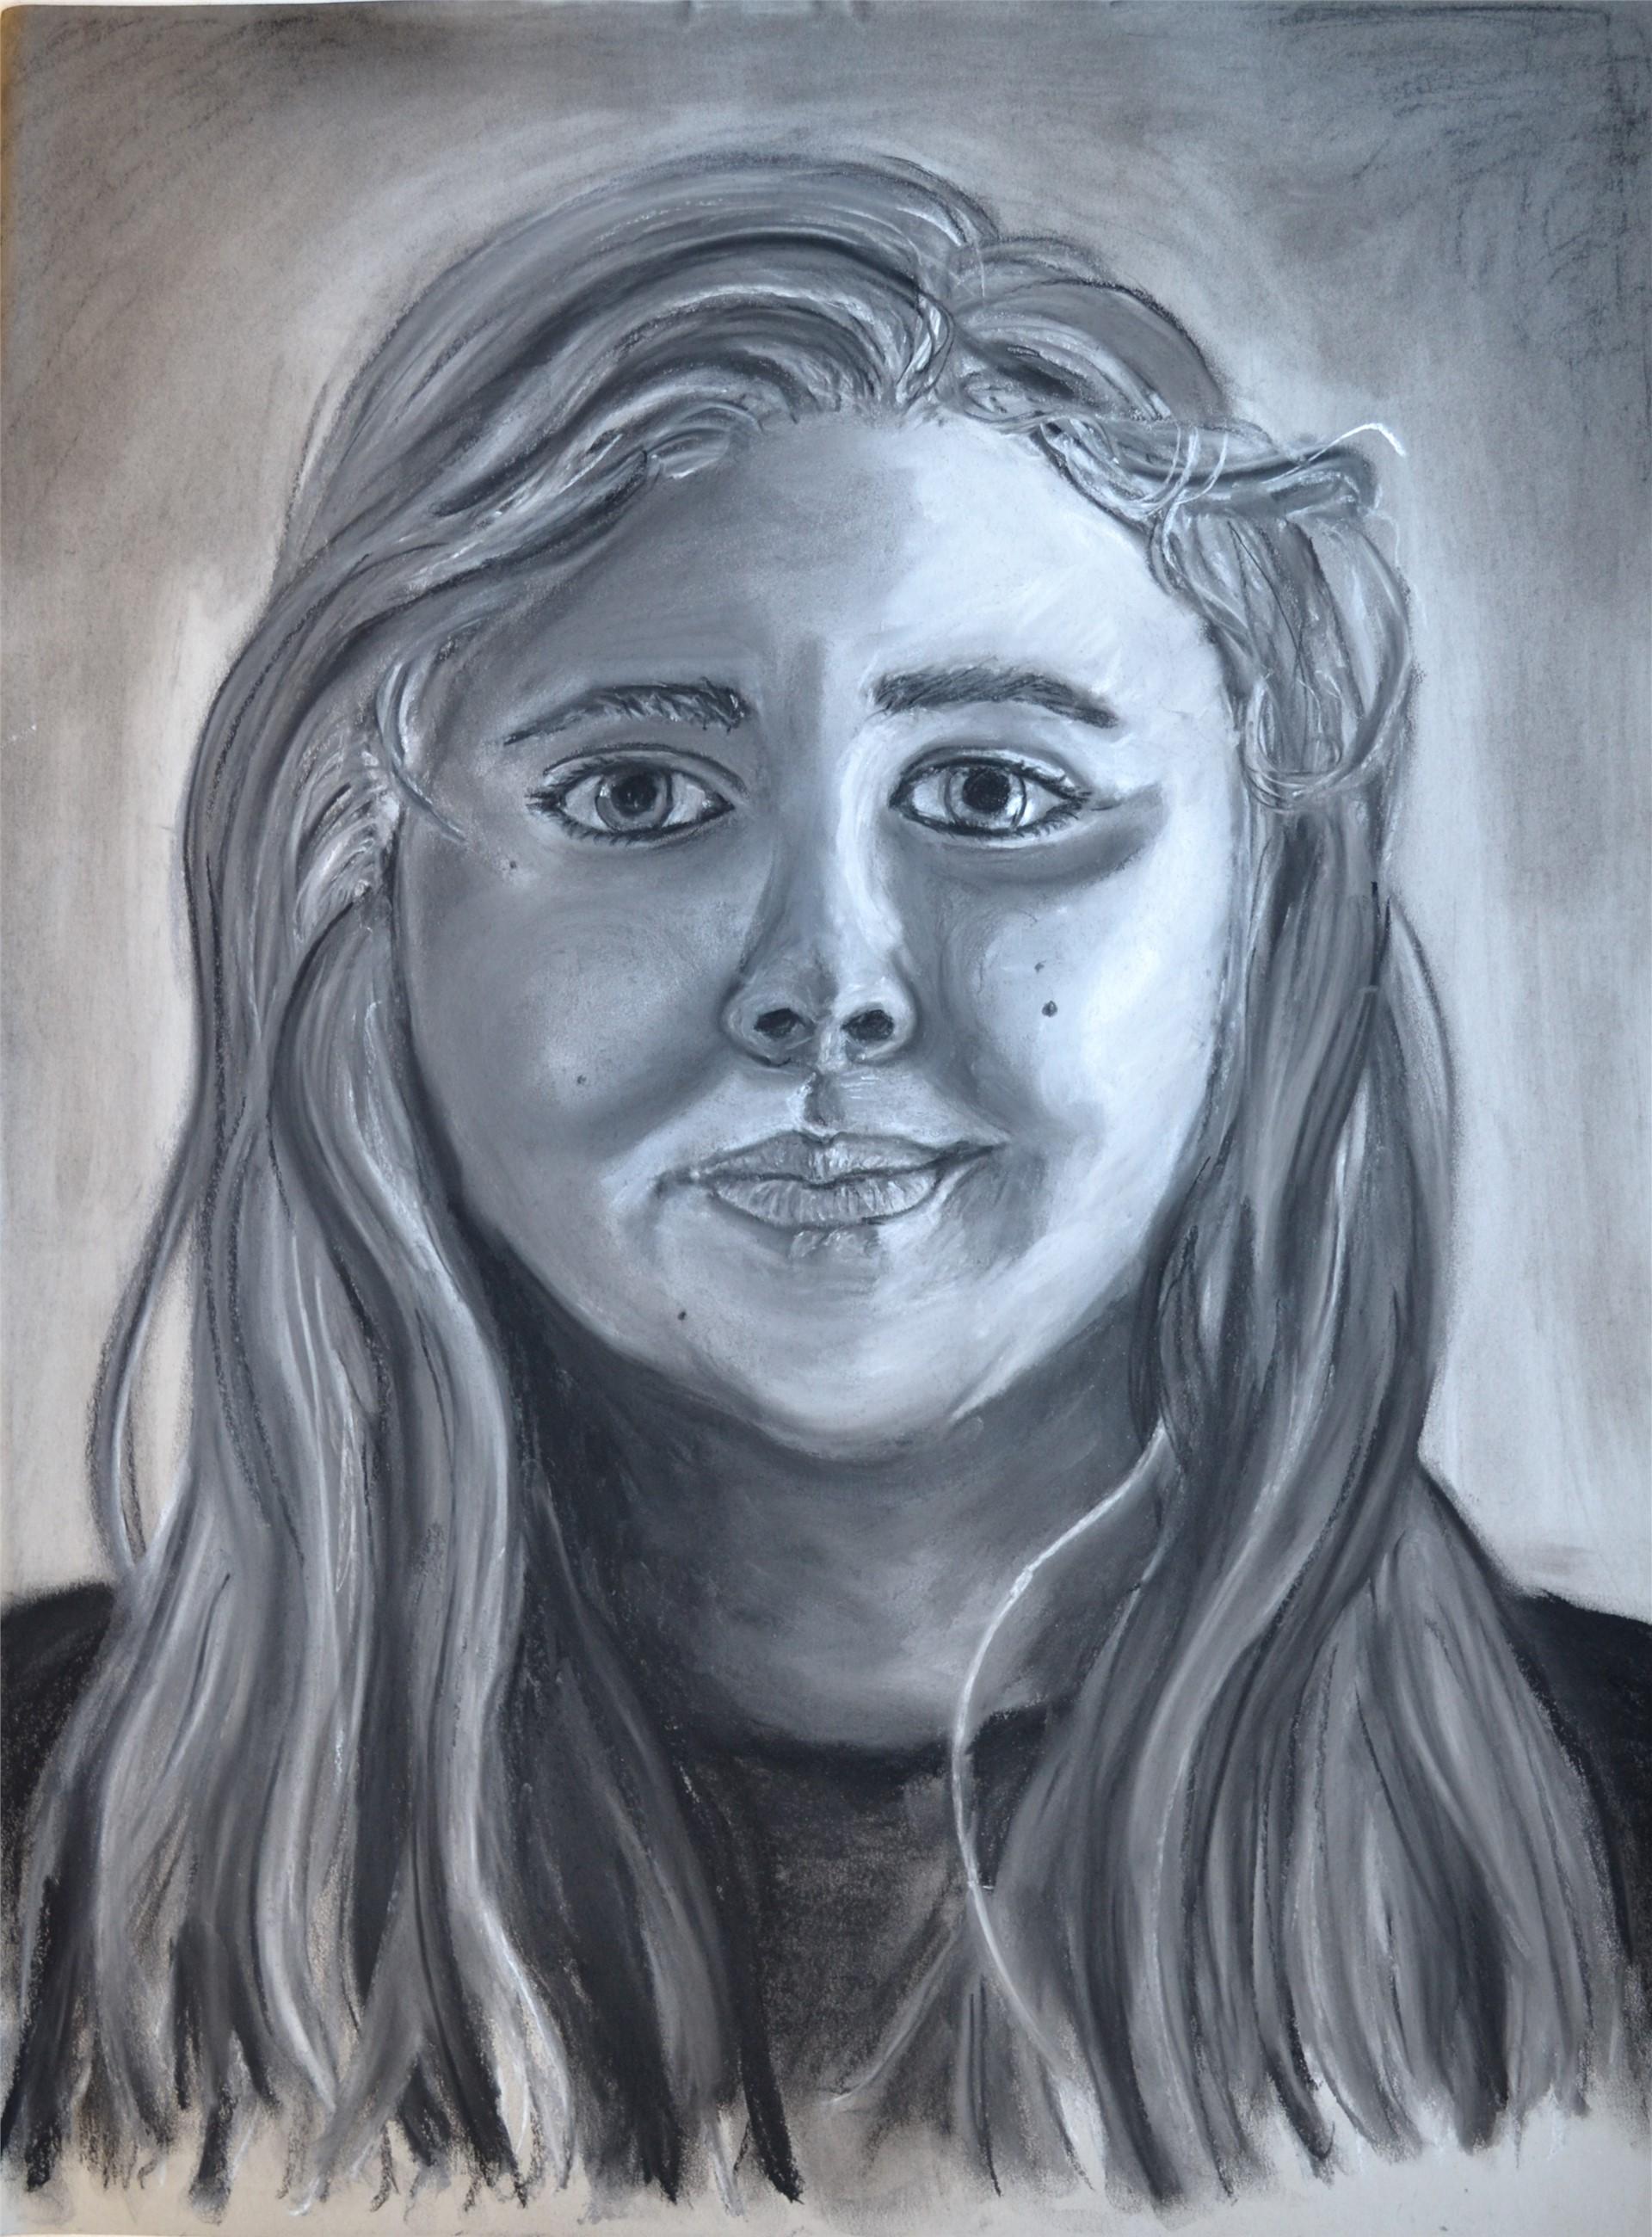 Amanda Rivers, Self Portrait, charcoal, pastel, on gray bogus, 24 x 18, 2016